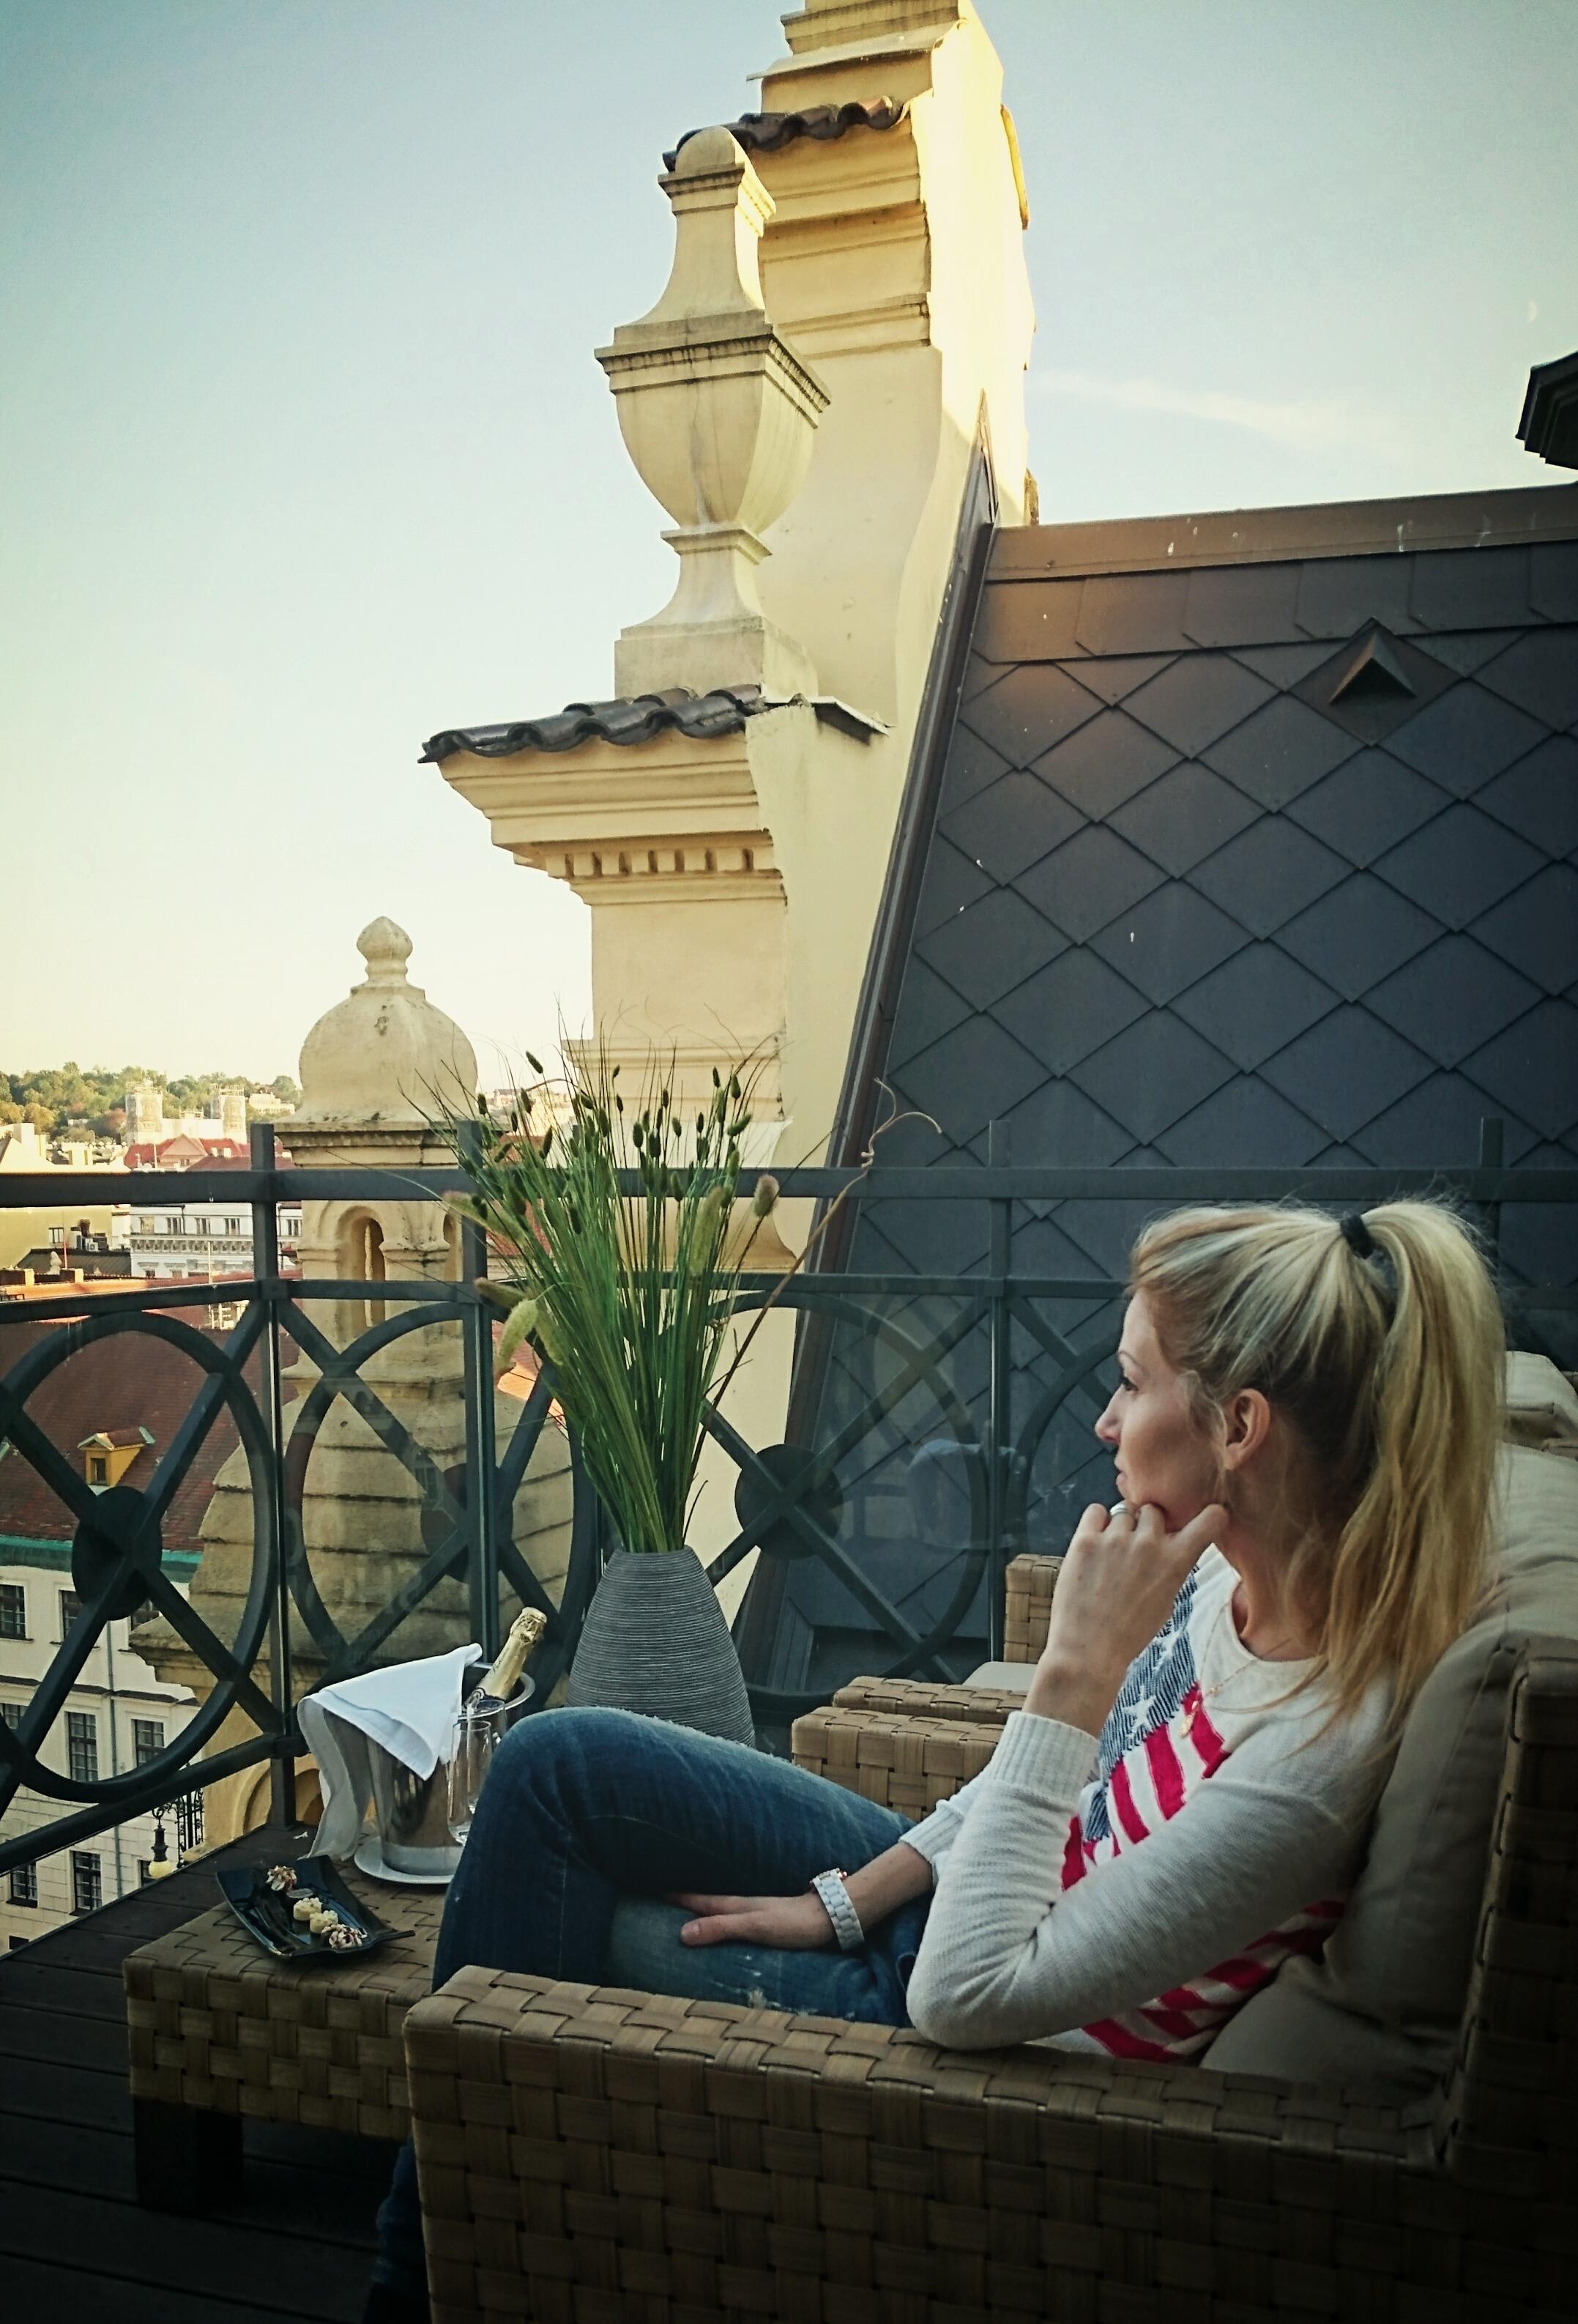 HotelKingsCourt_Inspiring.se_copyright_ChrizPhotography.se_mobile_1